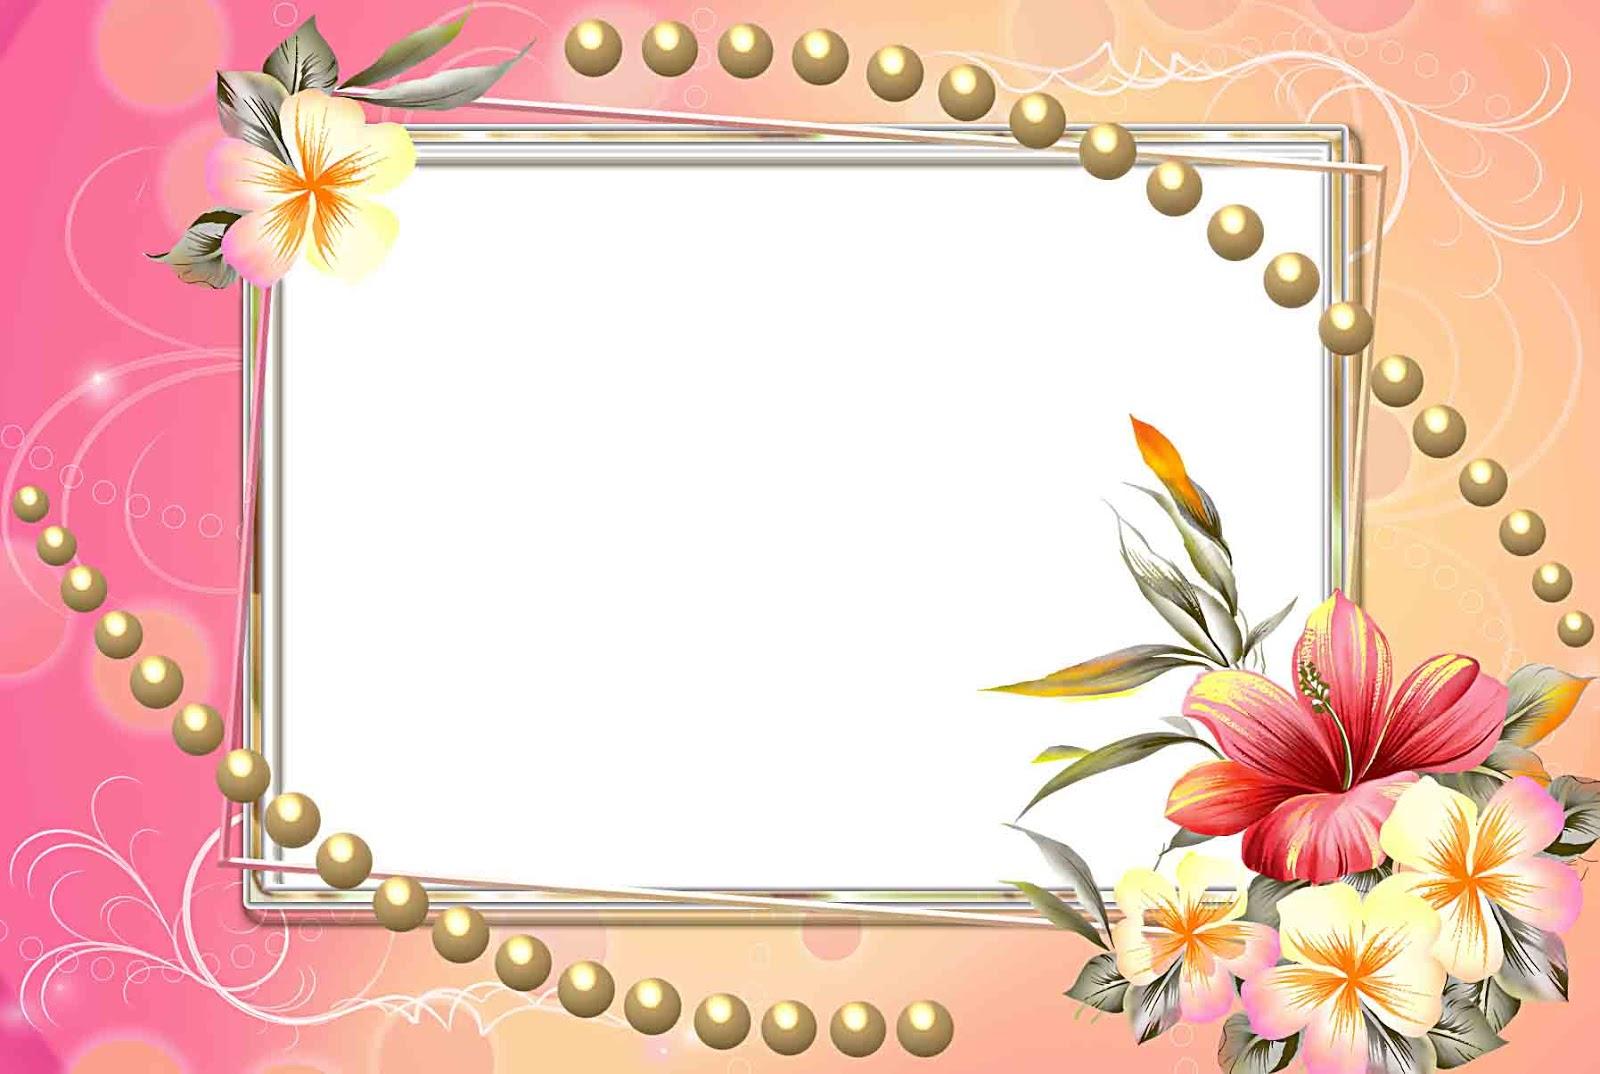 Latest Cute Baby Wallpaper Photoshop Frames Images Hd Wallpaper All 4u Wallpaper